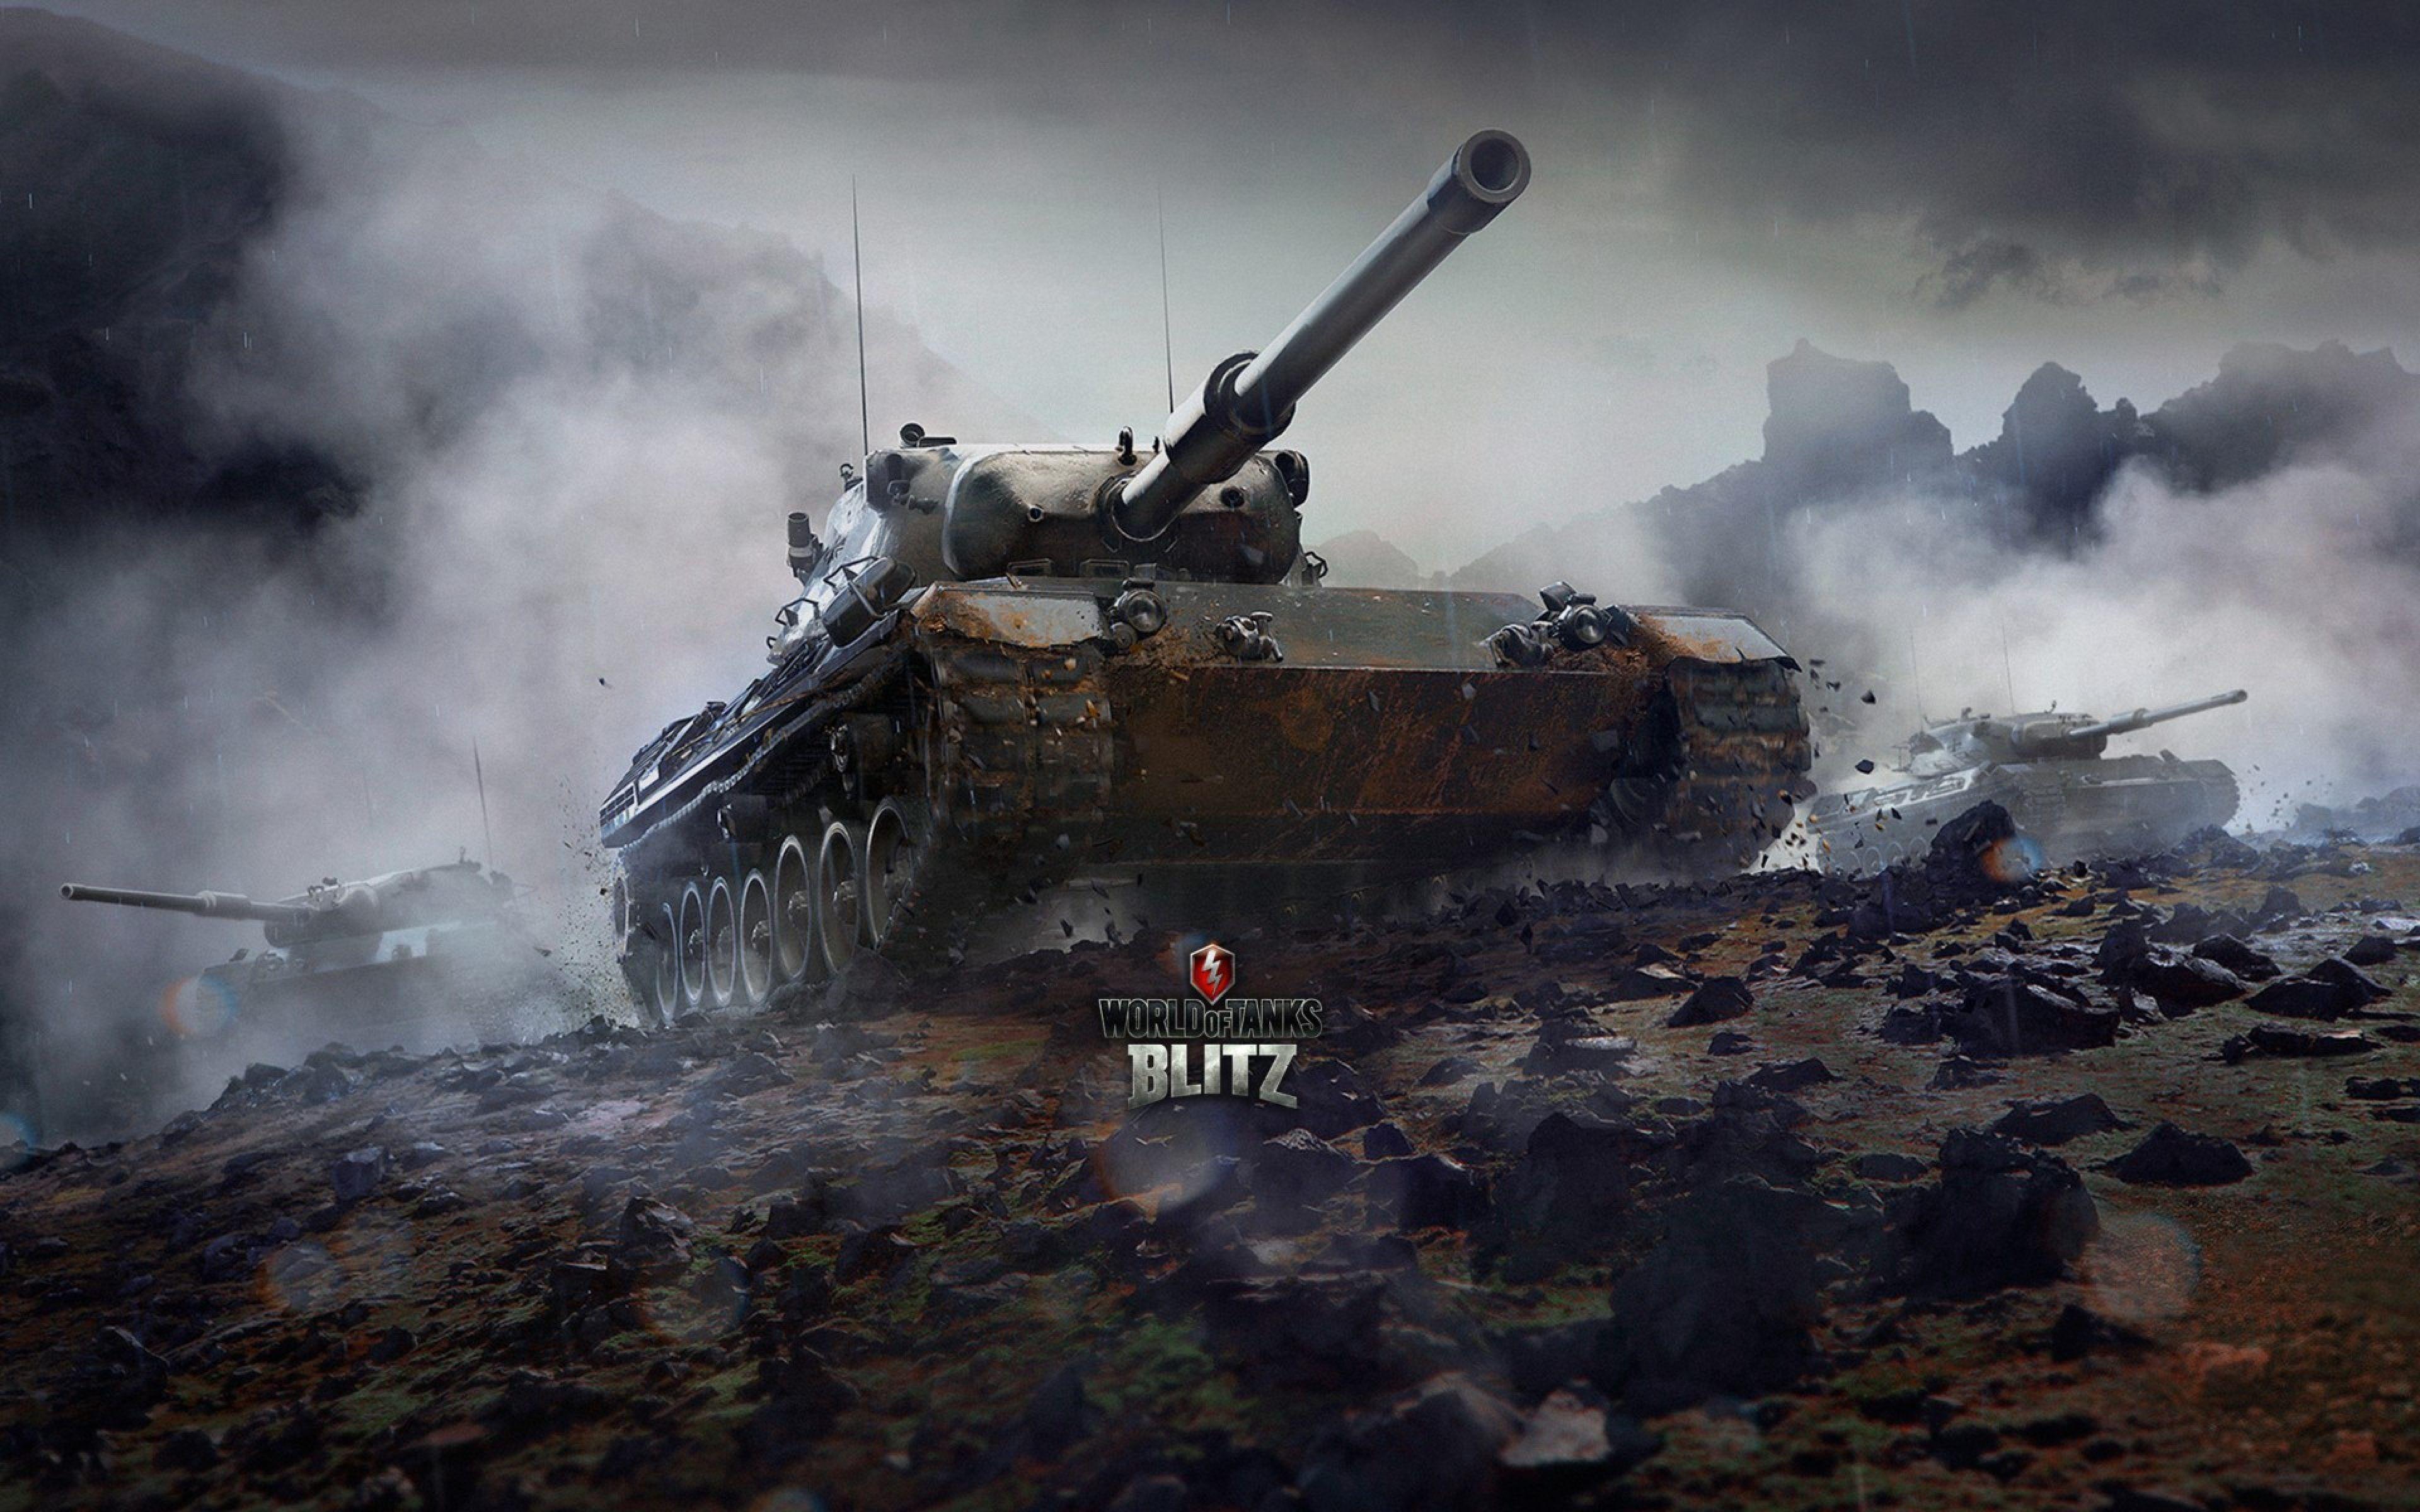 world of tank blitz game 4k wallpaper download high ...